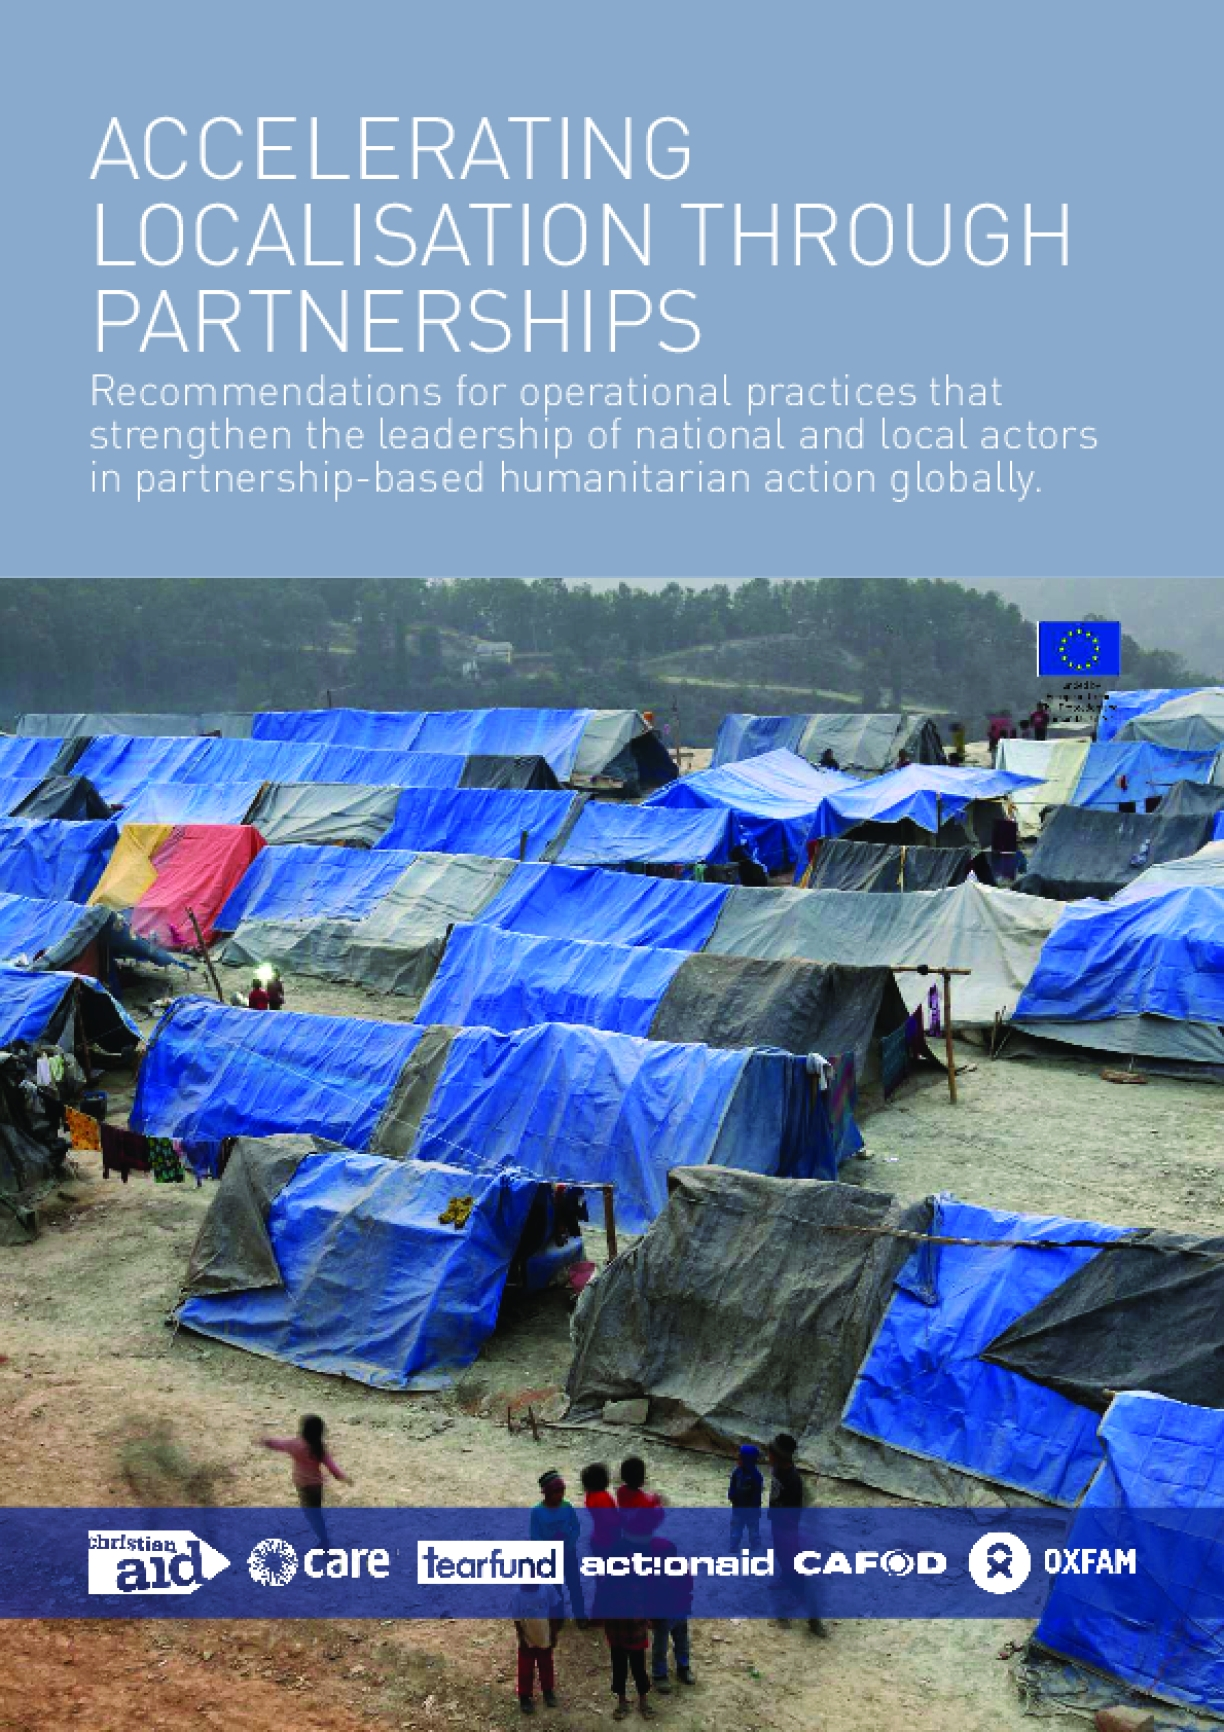 Accelerating Localisation Through Partnerships